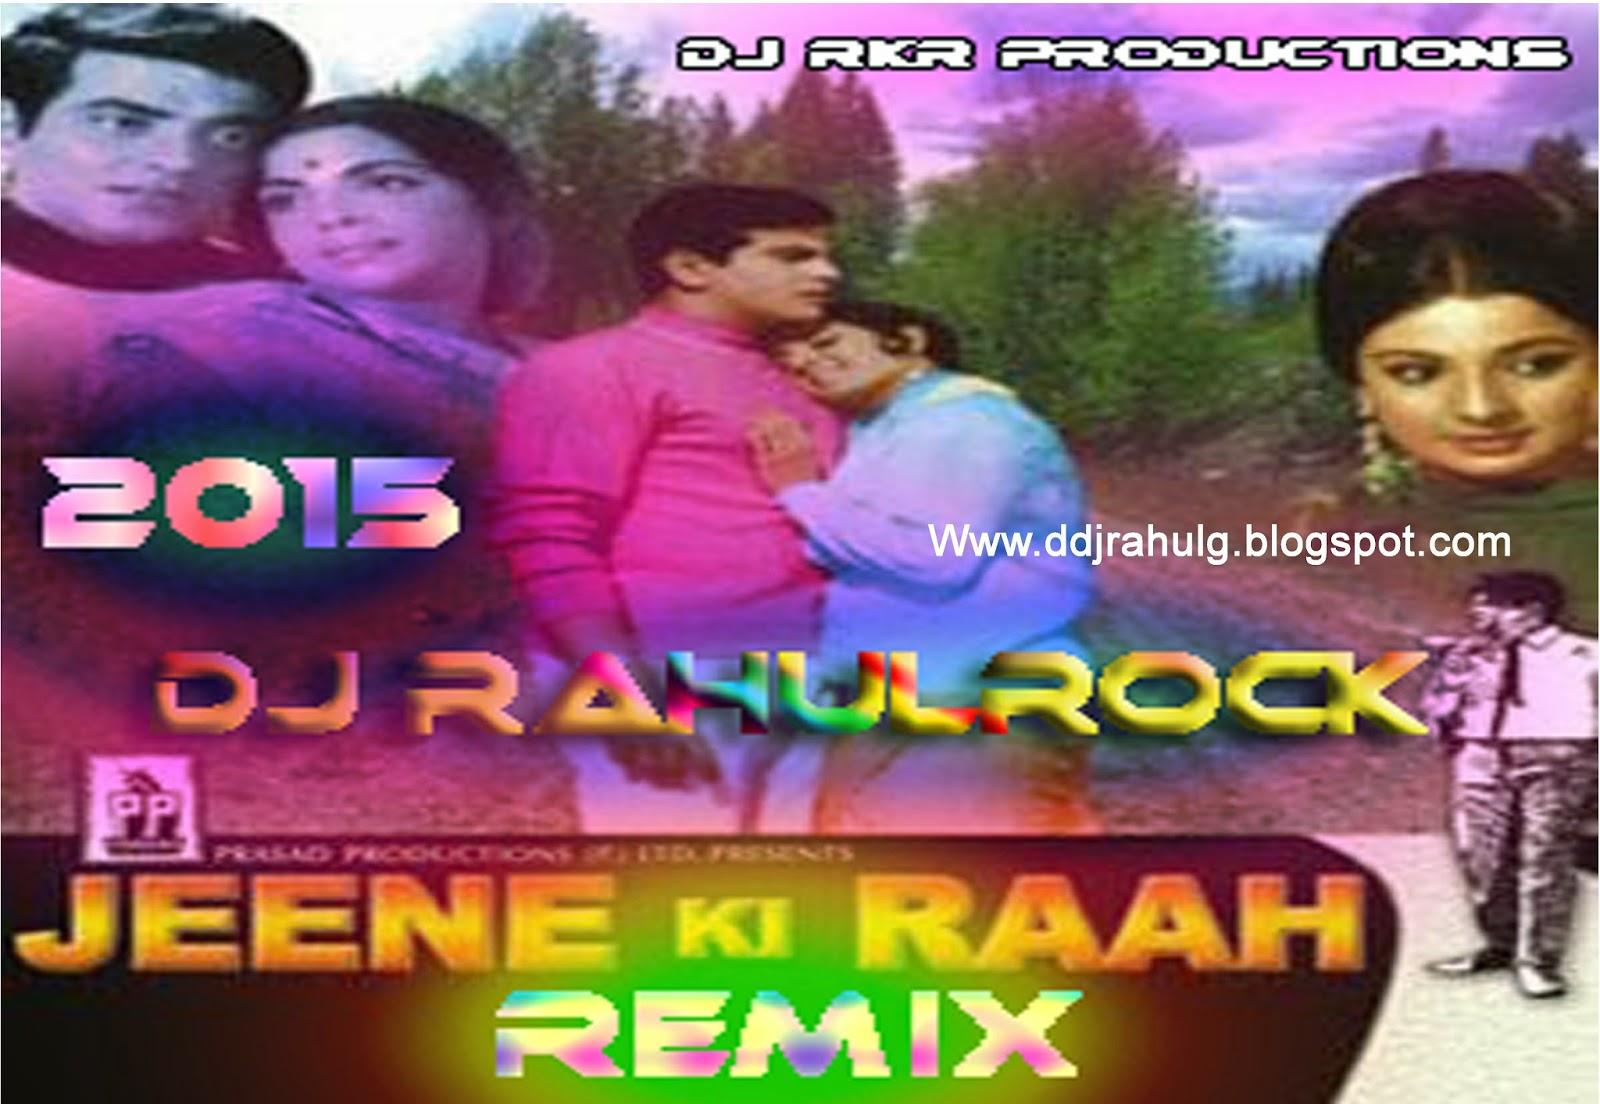 Aane Se Uske Aaye Bahar Dj Video Music Download - WOMUSIC